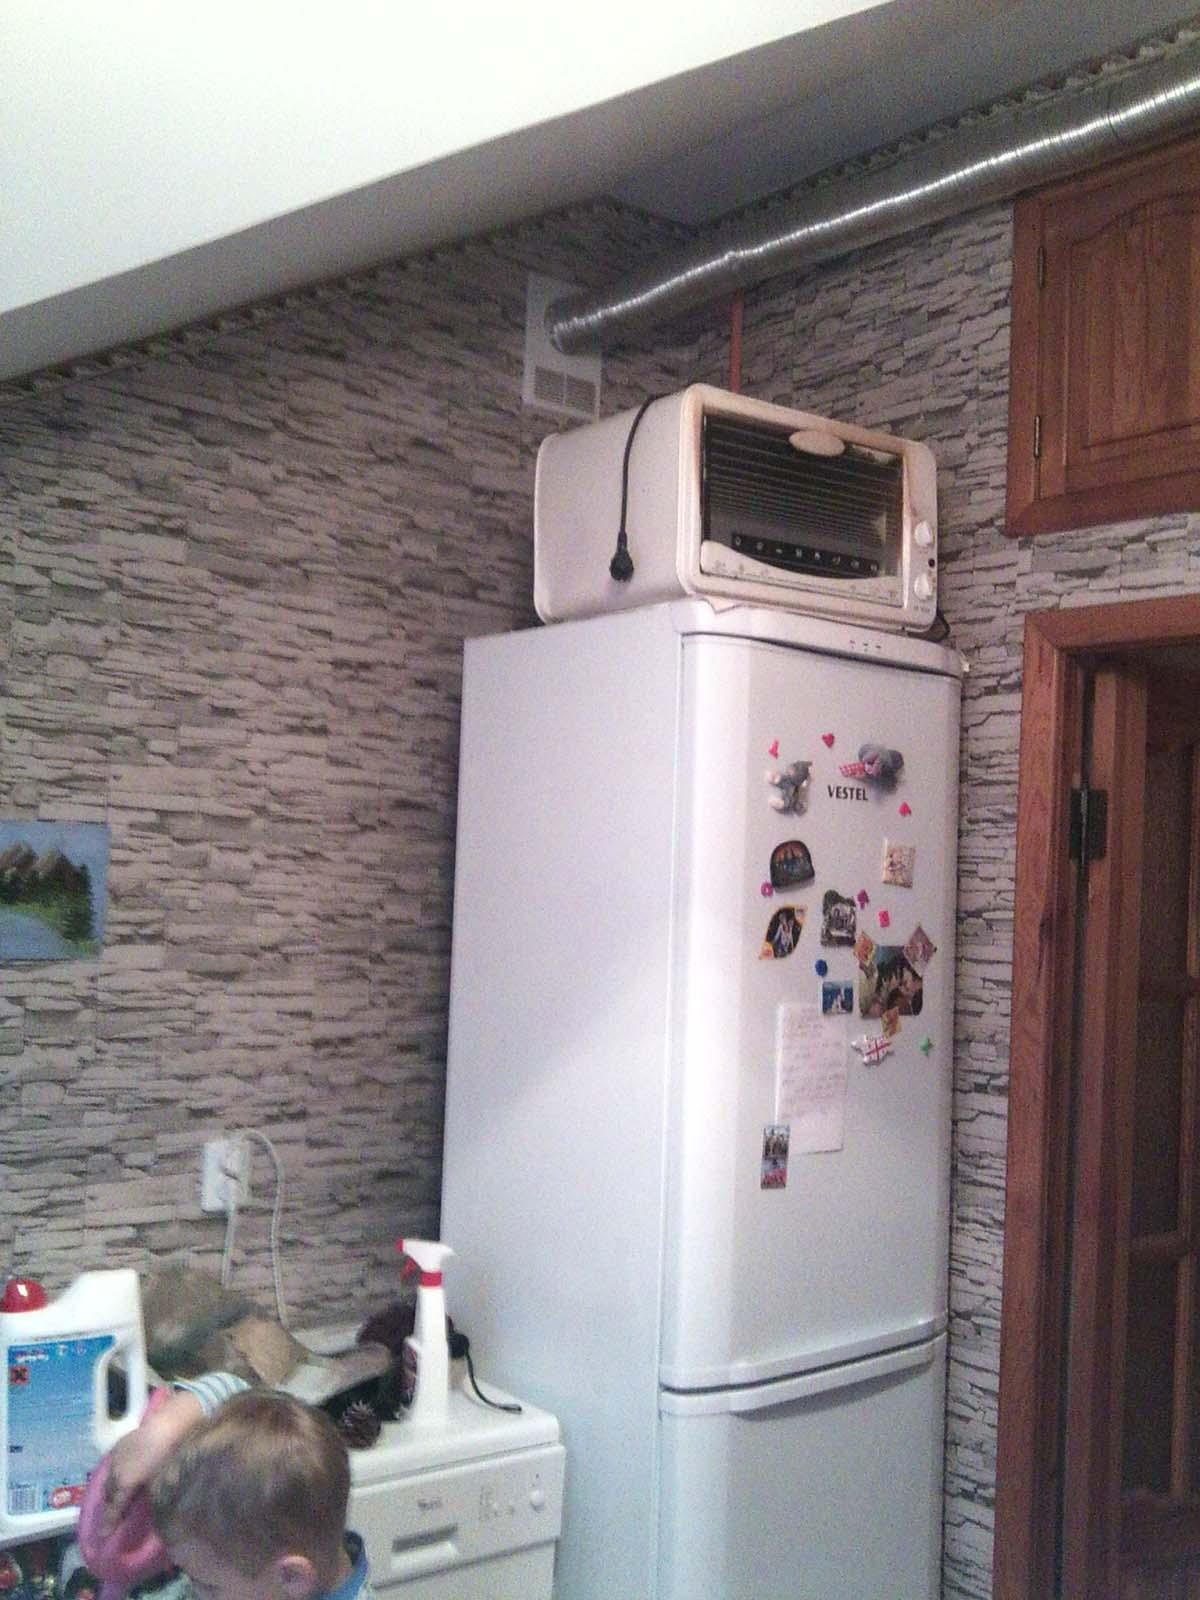 фото Продается 3-х комнатная квартира на Калараша с ремонтом.…: http://dkru.ru/obyavleniya-nedvijimost/sell/flat/all/all_11892.html?template=172&file=10